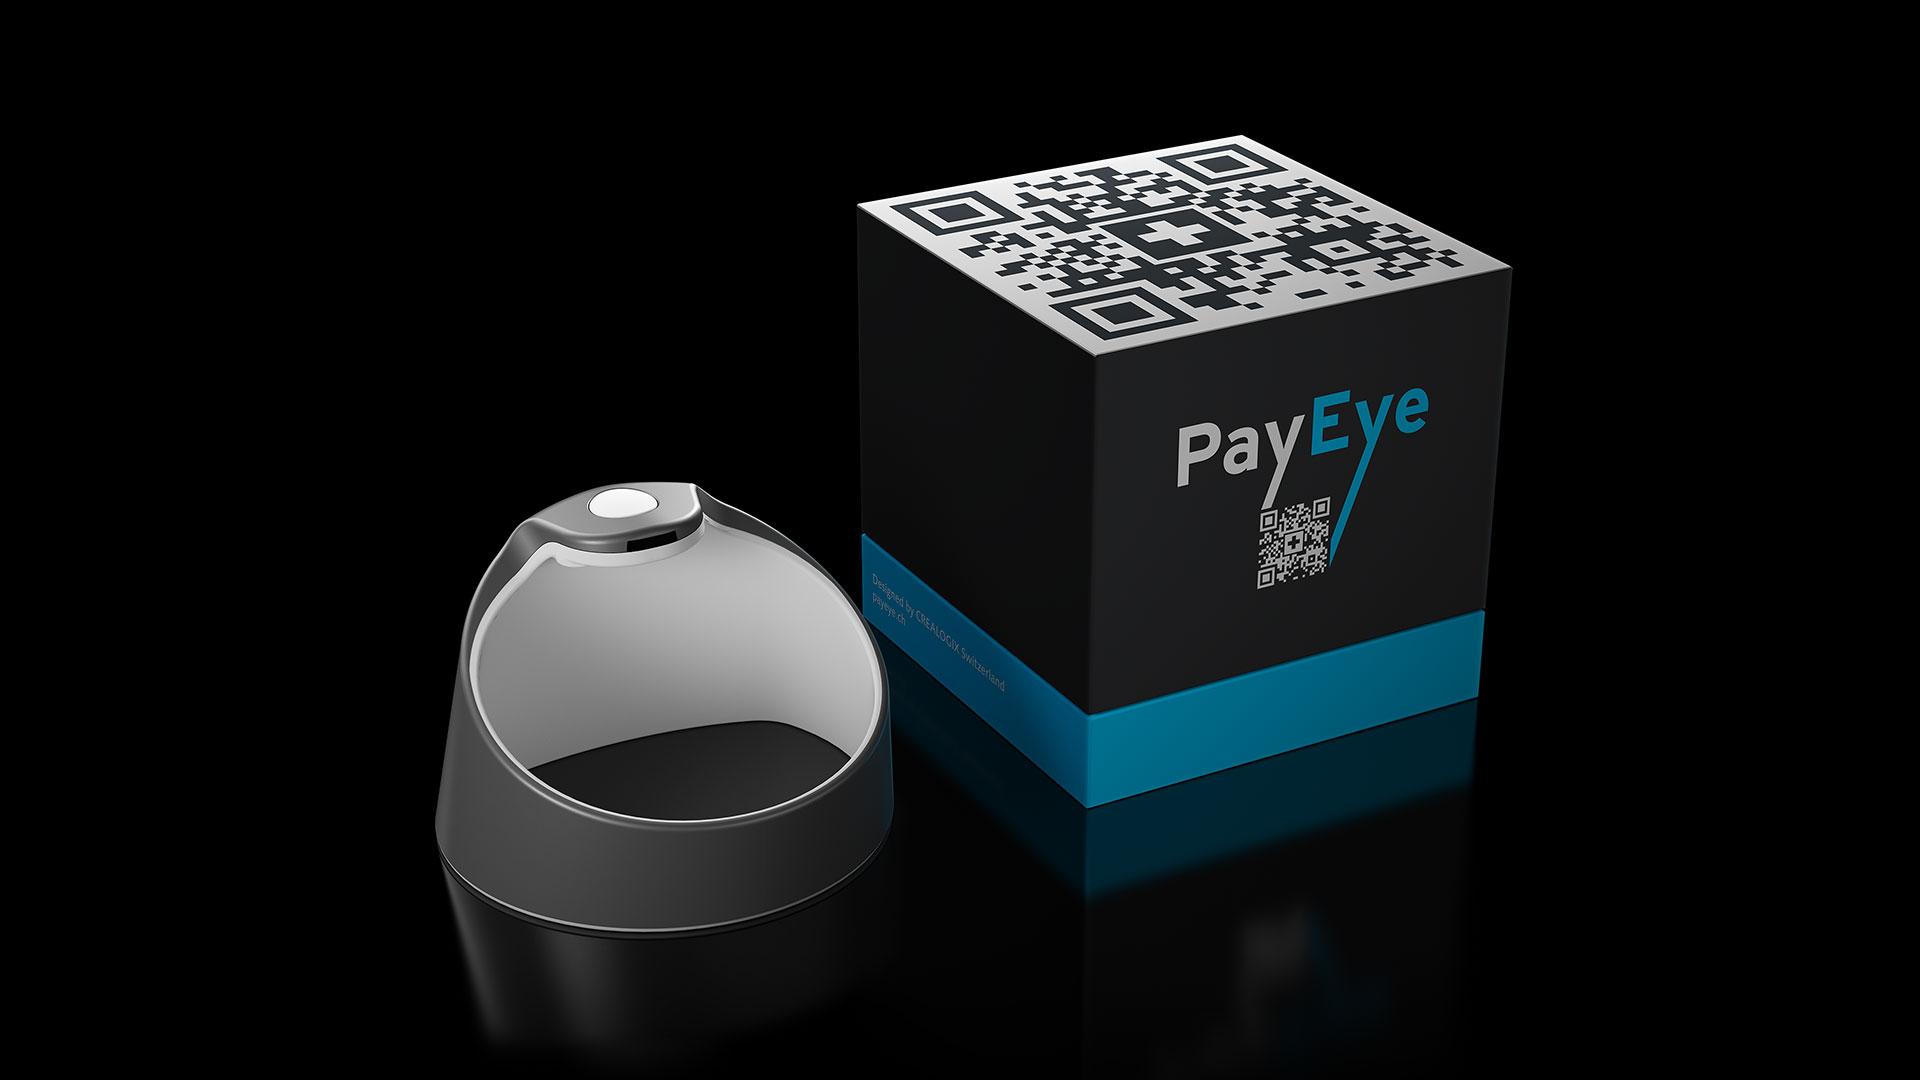 blokstudio_PayEye_HeroShot_Silver_Package